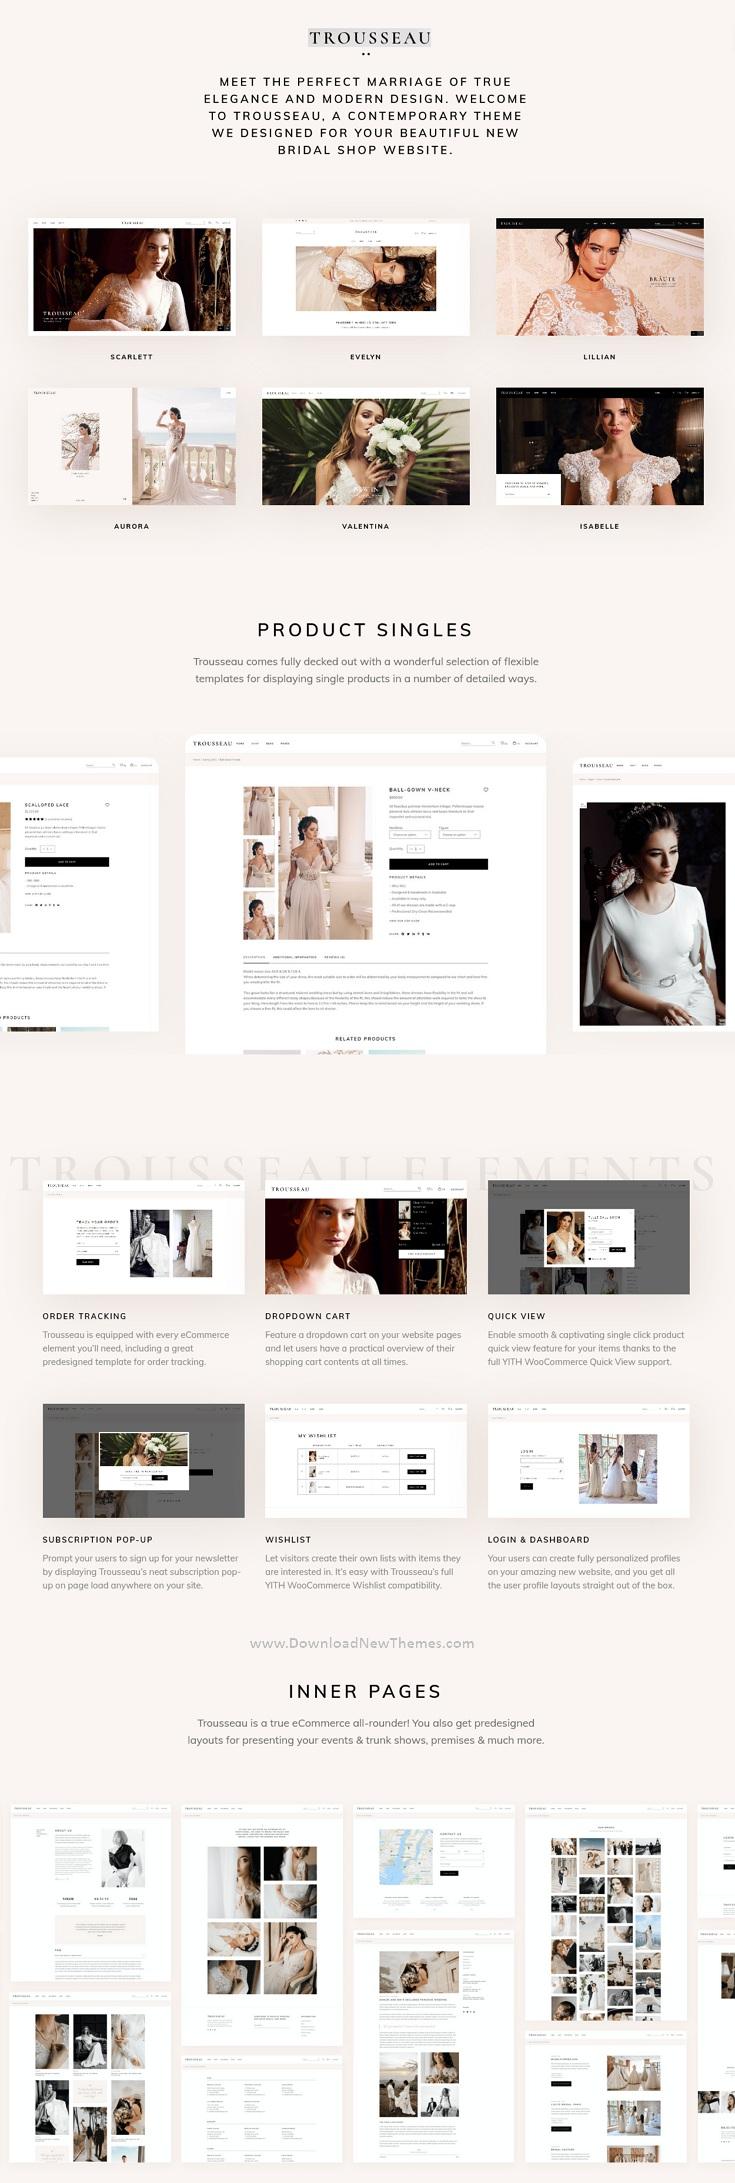 Bridal Shop Responsive Website Theme